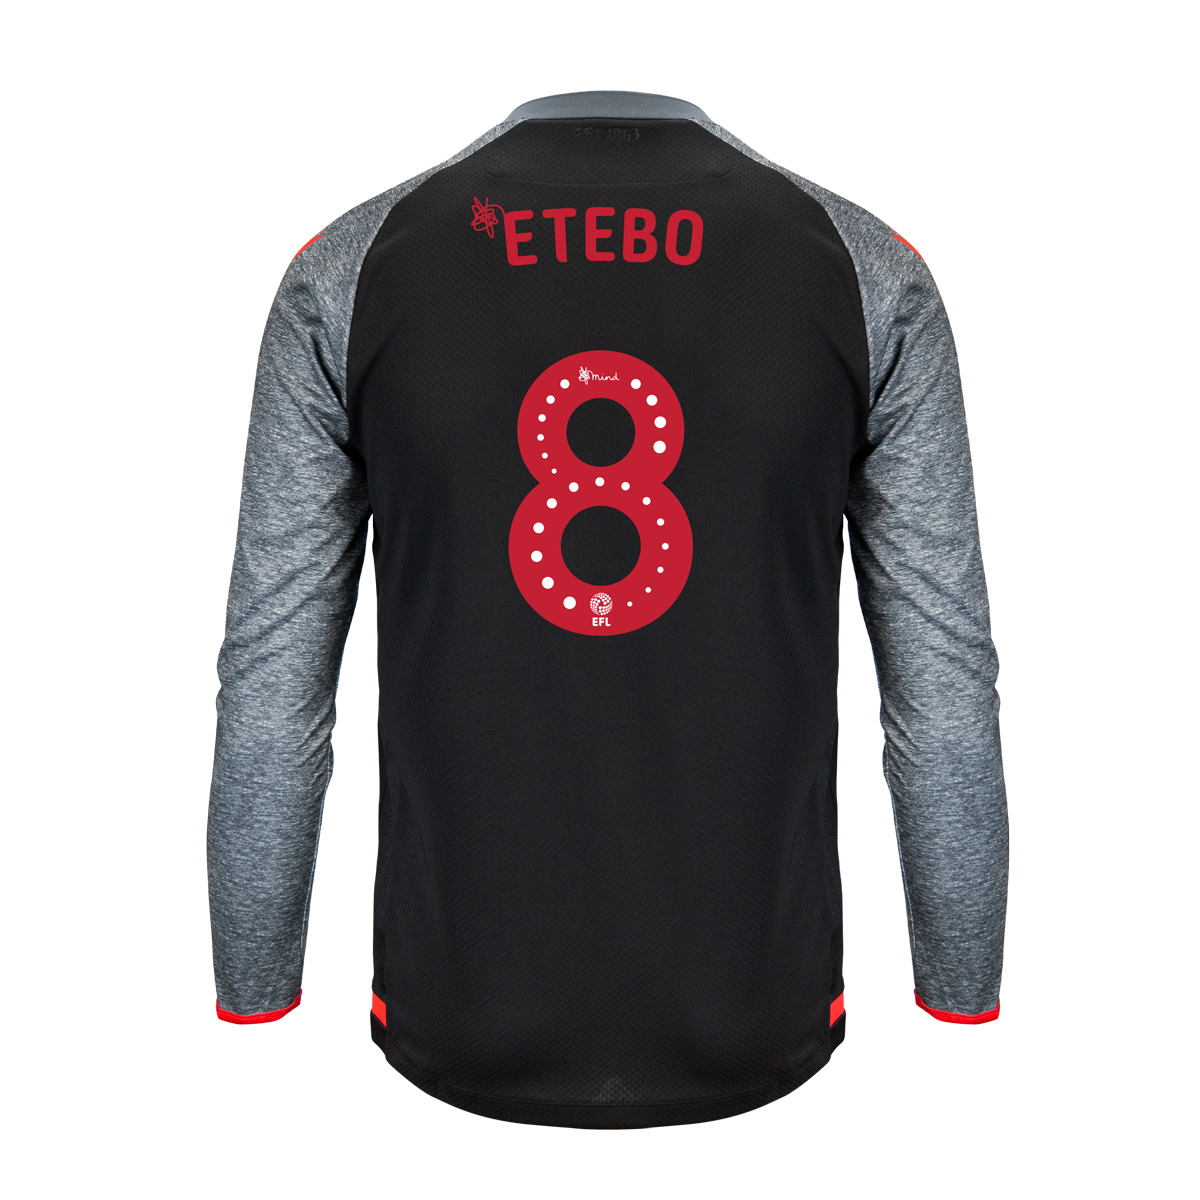 2019/20 Adult Away LS Shirt - Etebo